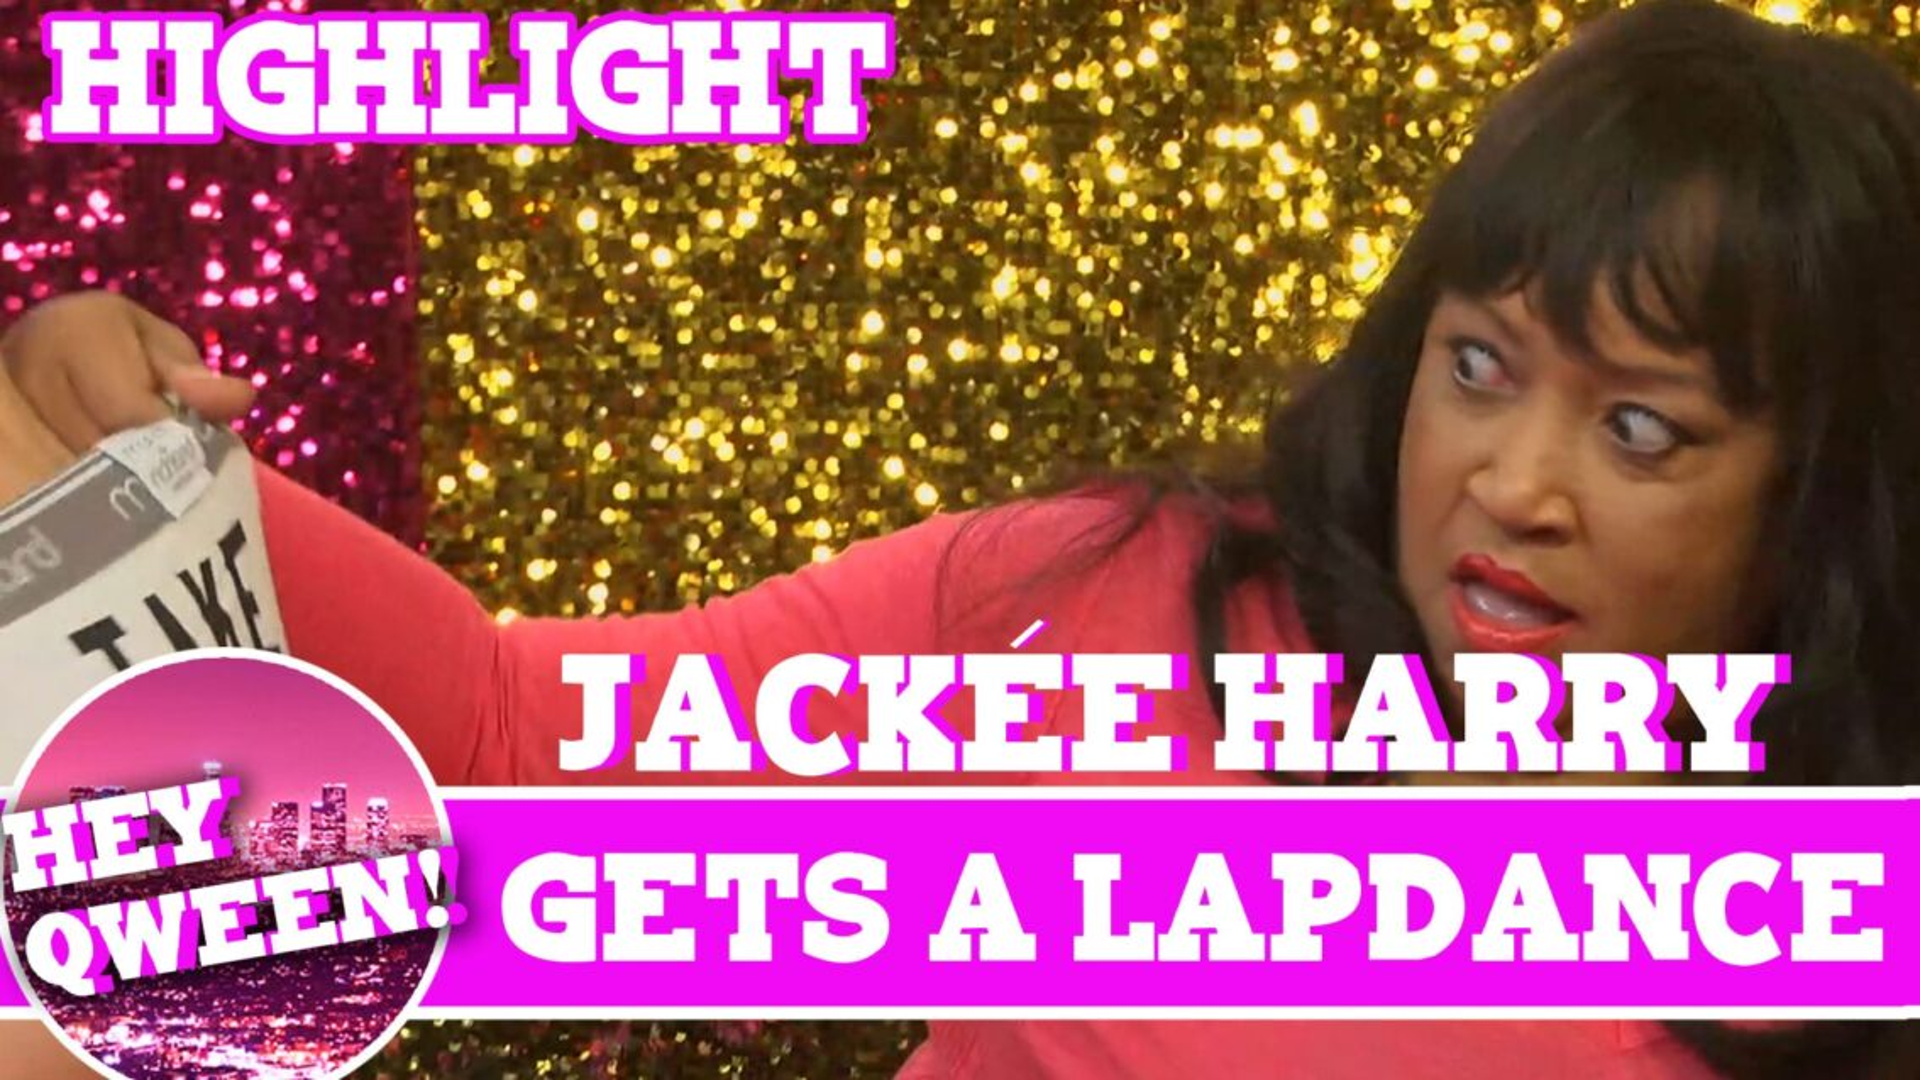 Hey Qween! BONUS: Jackee Harry Gets A Lap Dance